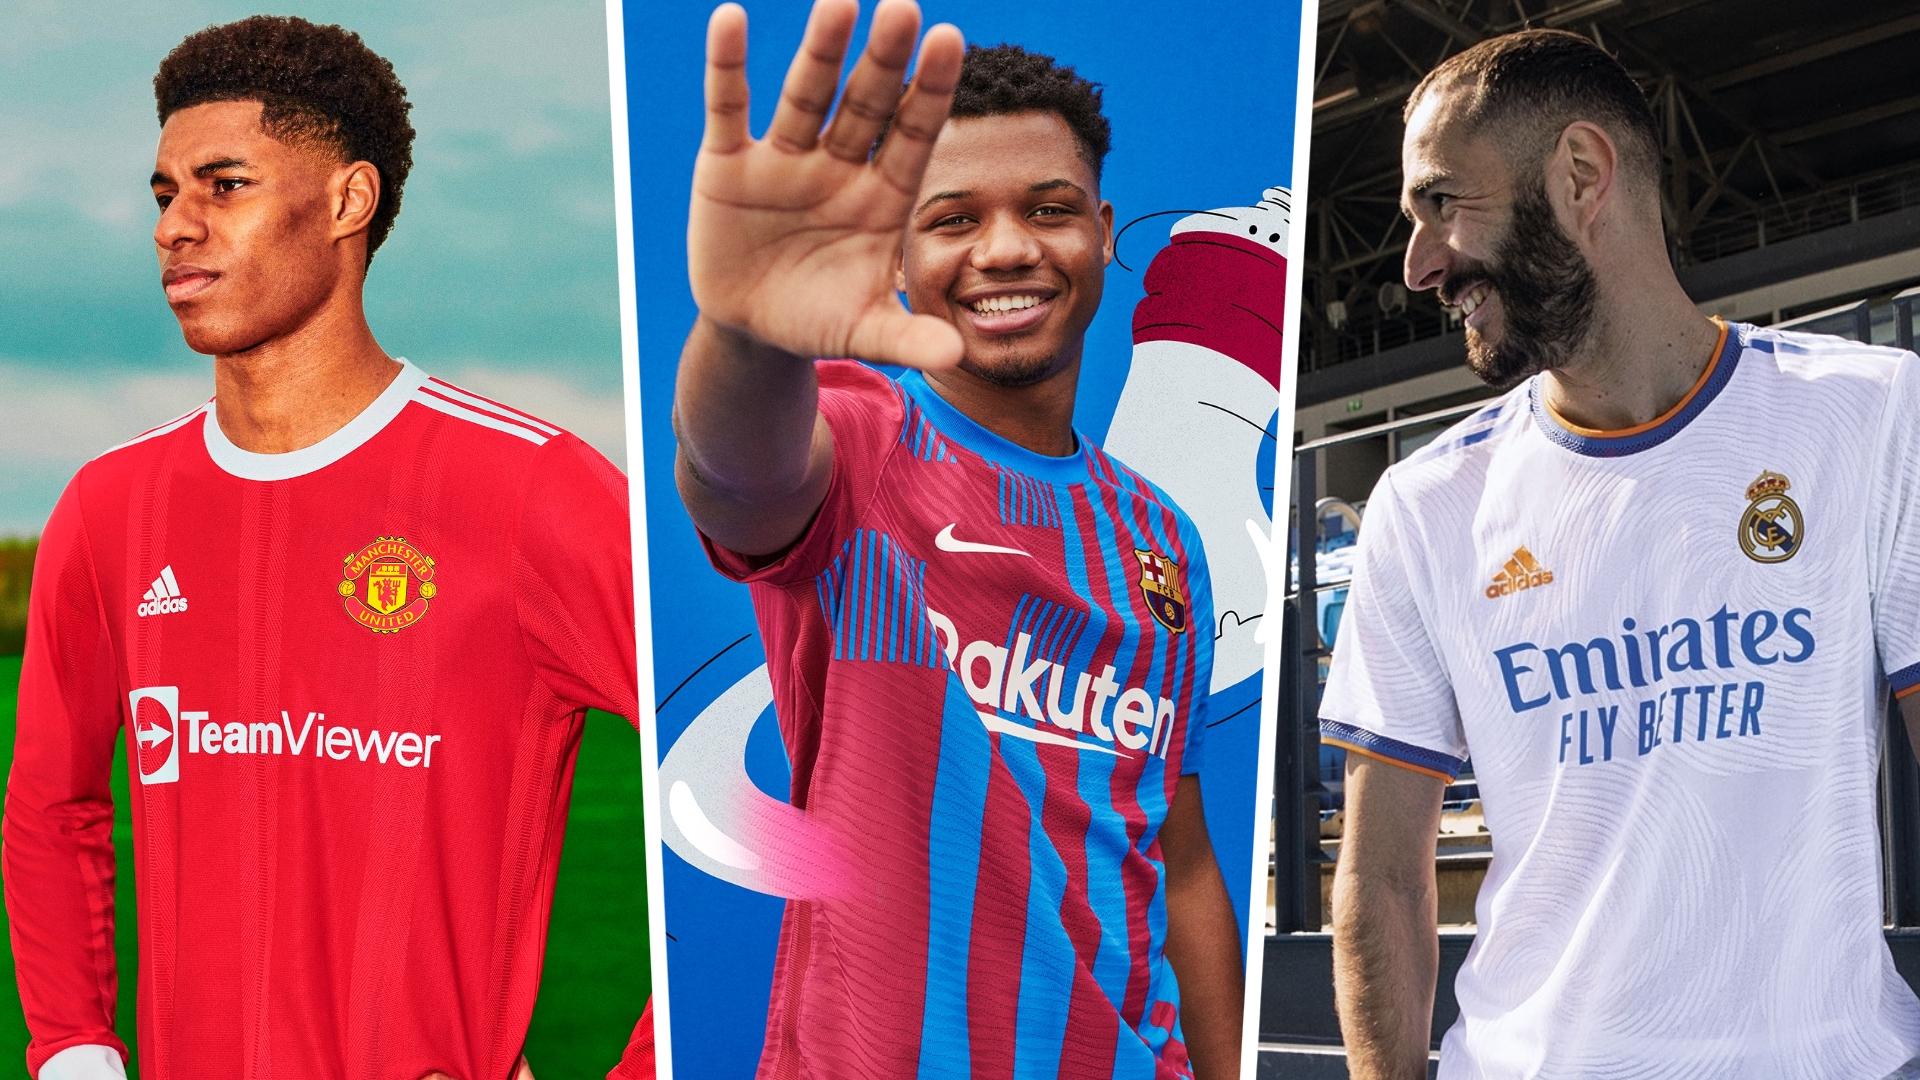 New 2021 22 Football Kits Barcelona Man Utd All The Top Clubs Shirts Jerseys Revealed Goal Com